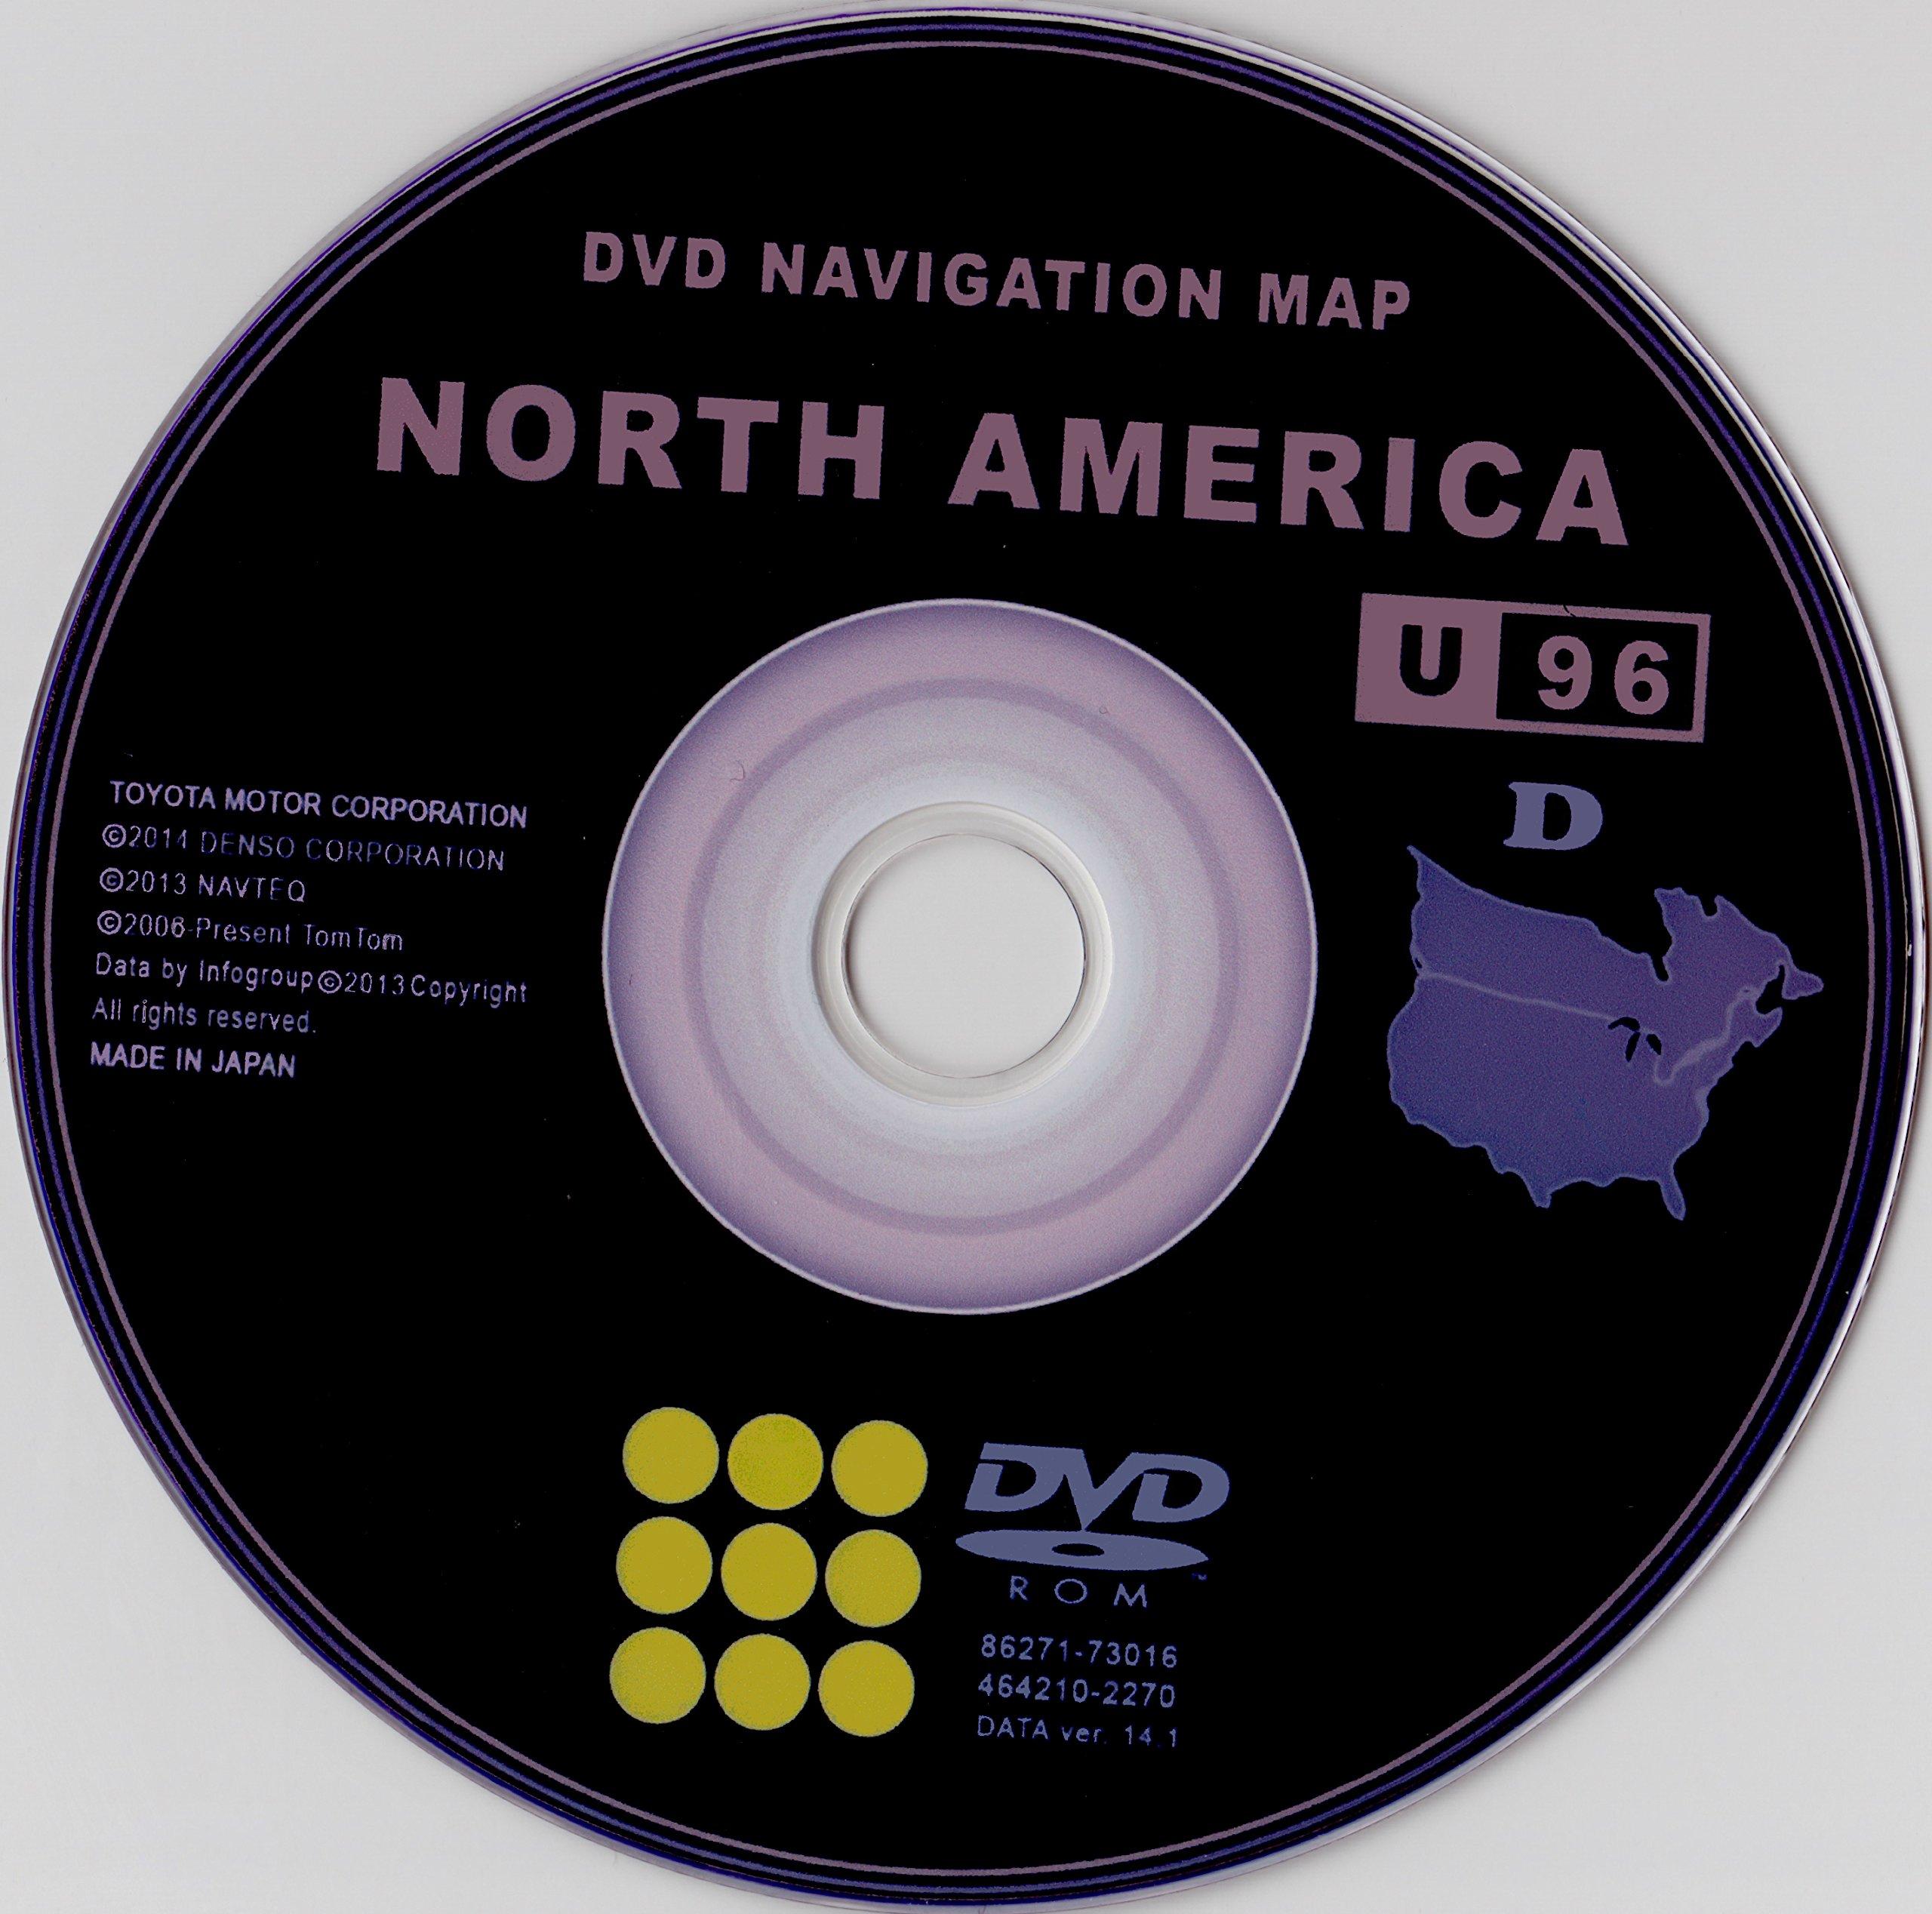 Cheap Toyota Dvd Navigation Update, find Toyota Dvd Navigation ... on